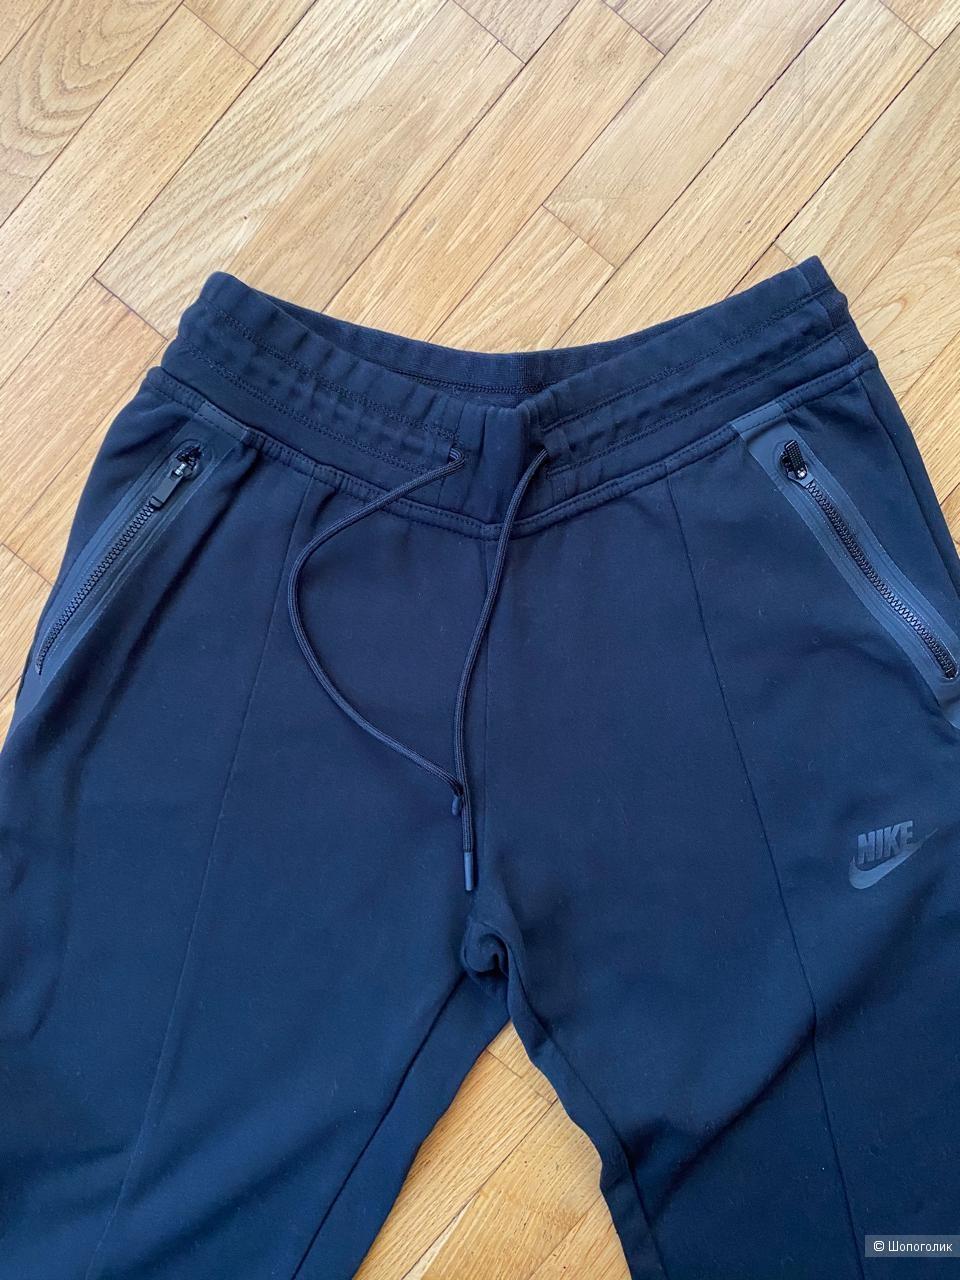 Спортивные брюки Nike , размер s.